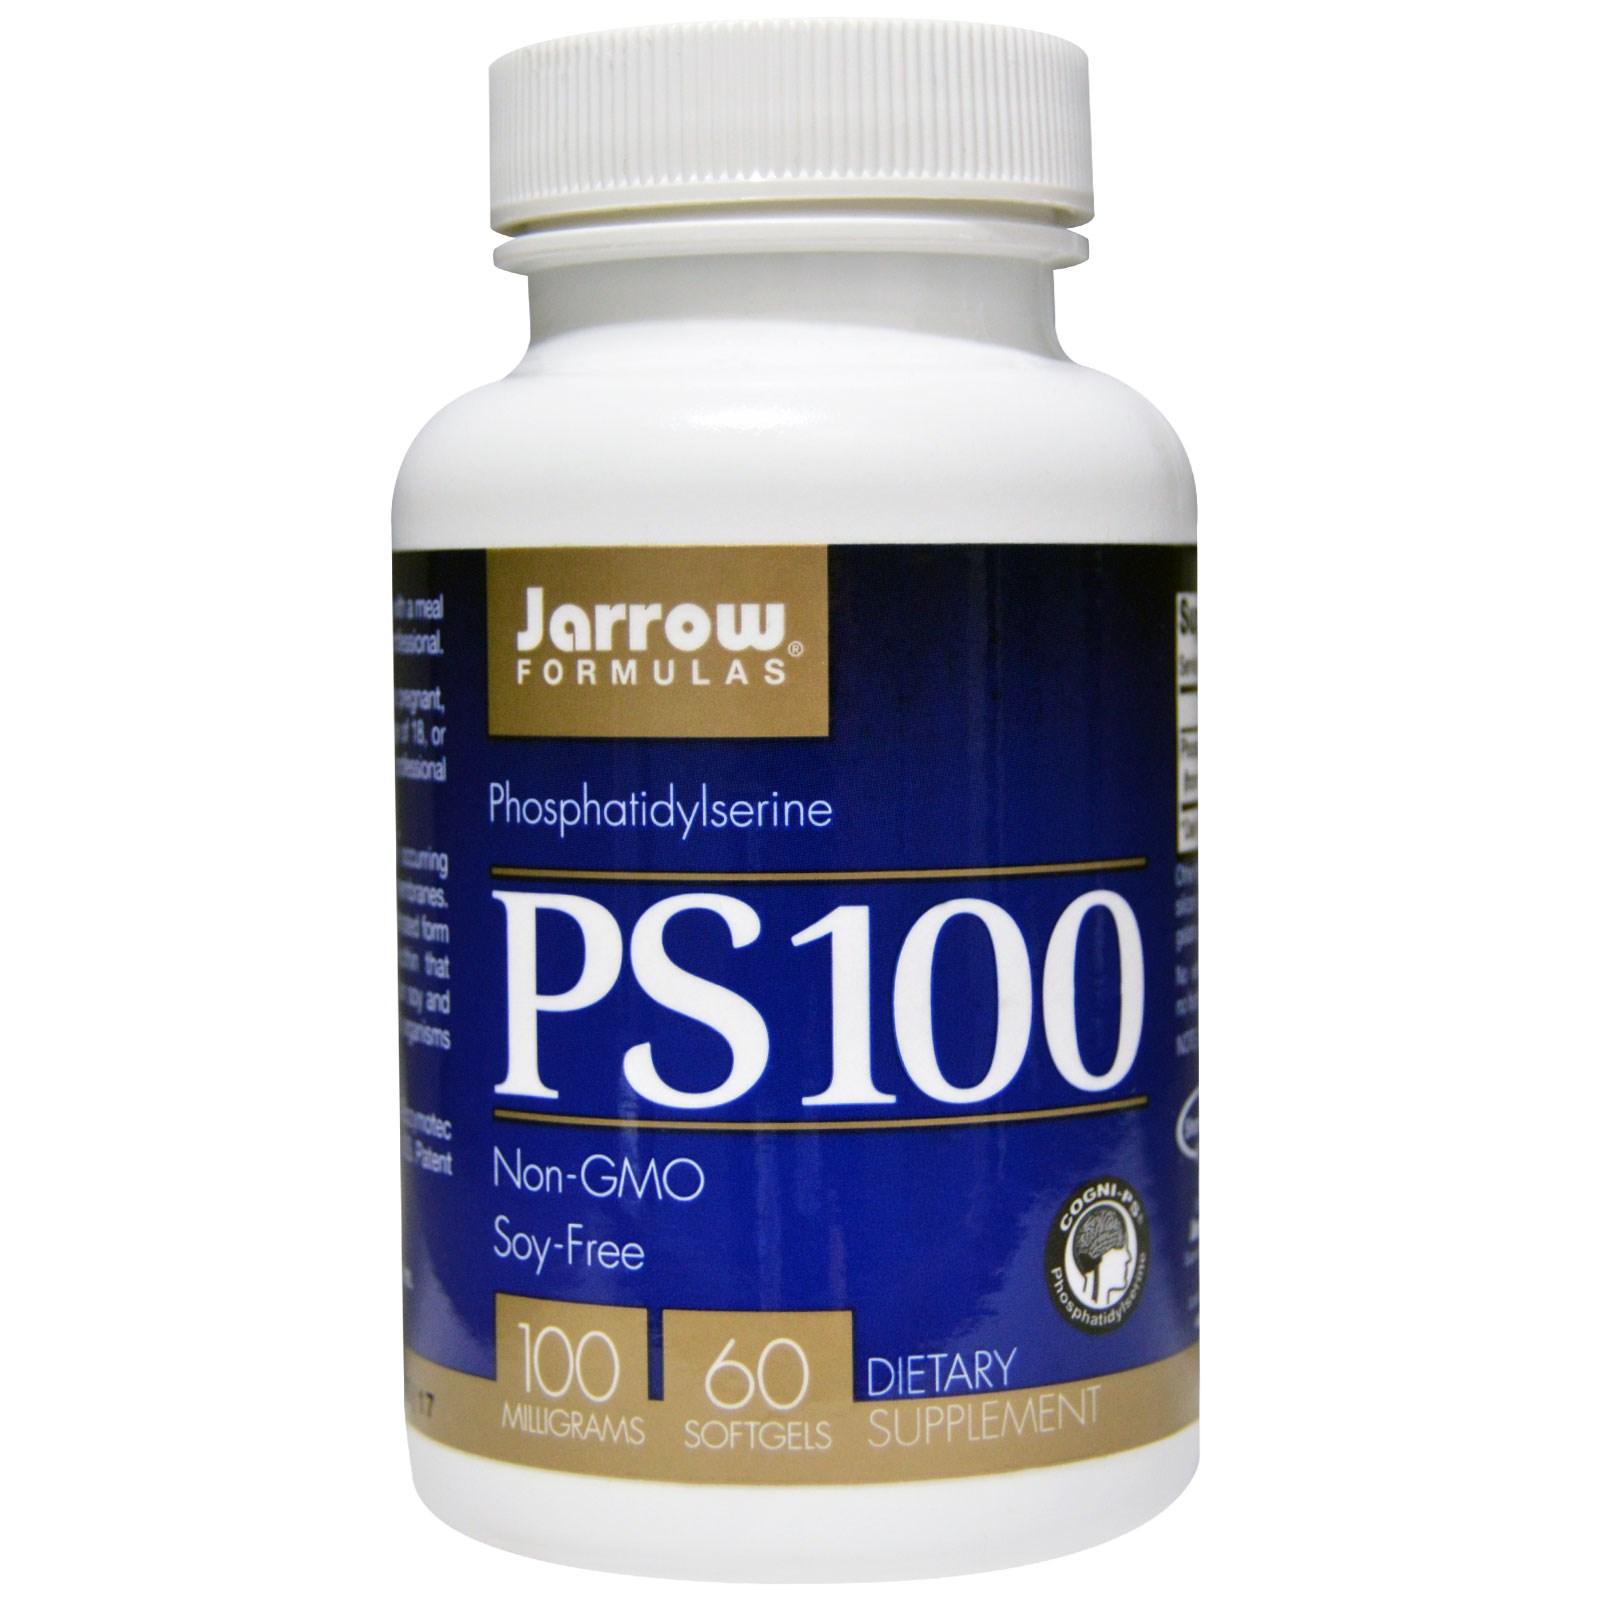 Image of PS100, Phosphatidylserine 100 mg (60 Softgels) - Jarrow Formulas 0790011160069